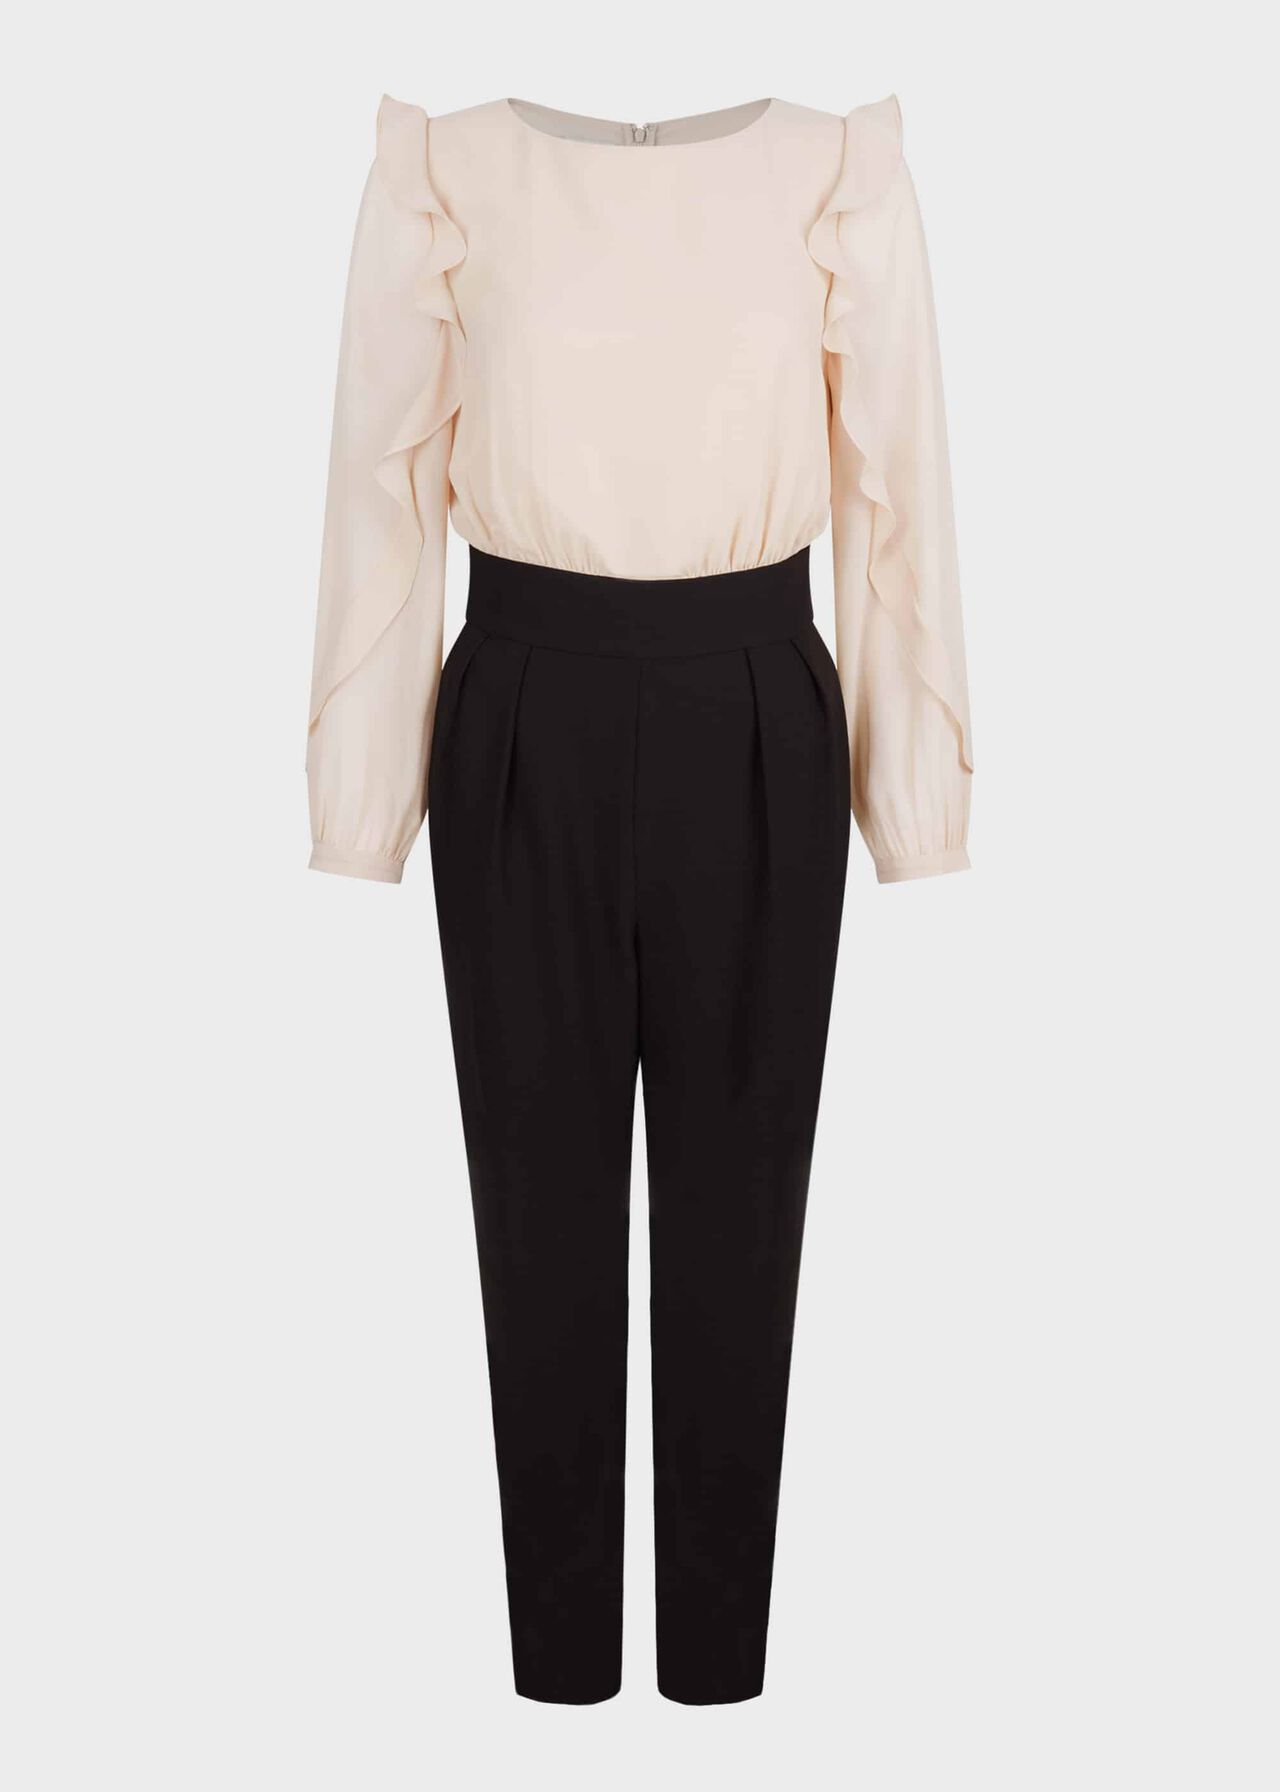 Aubree Colourblock Jumpsuit Blush Black